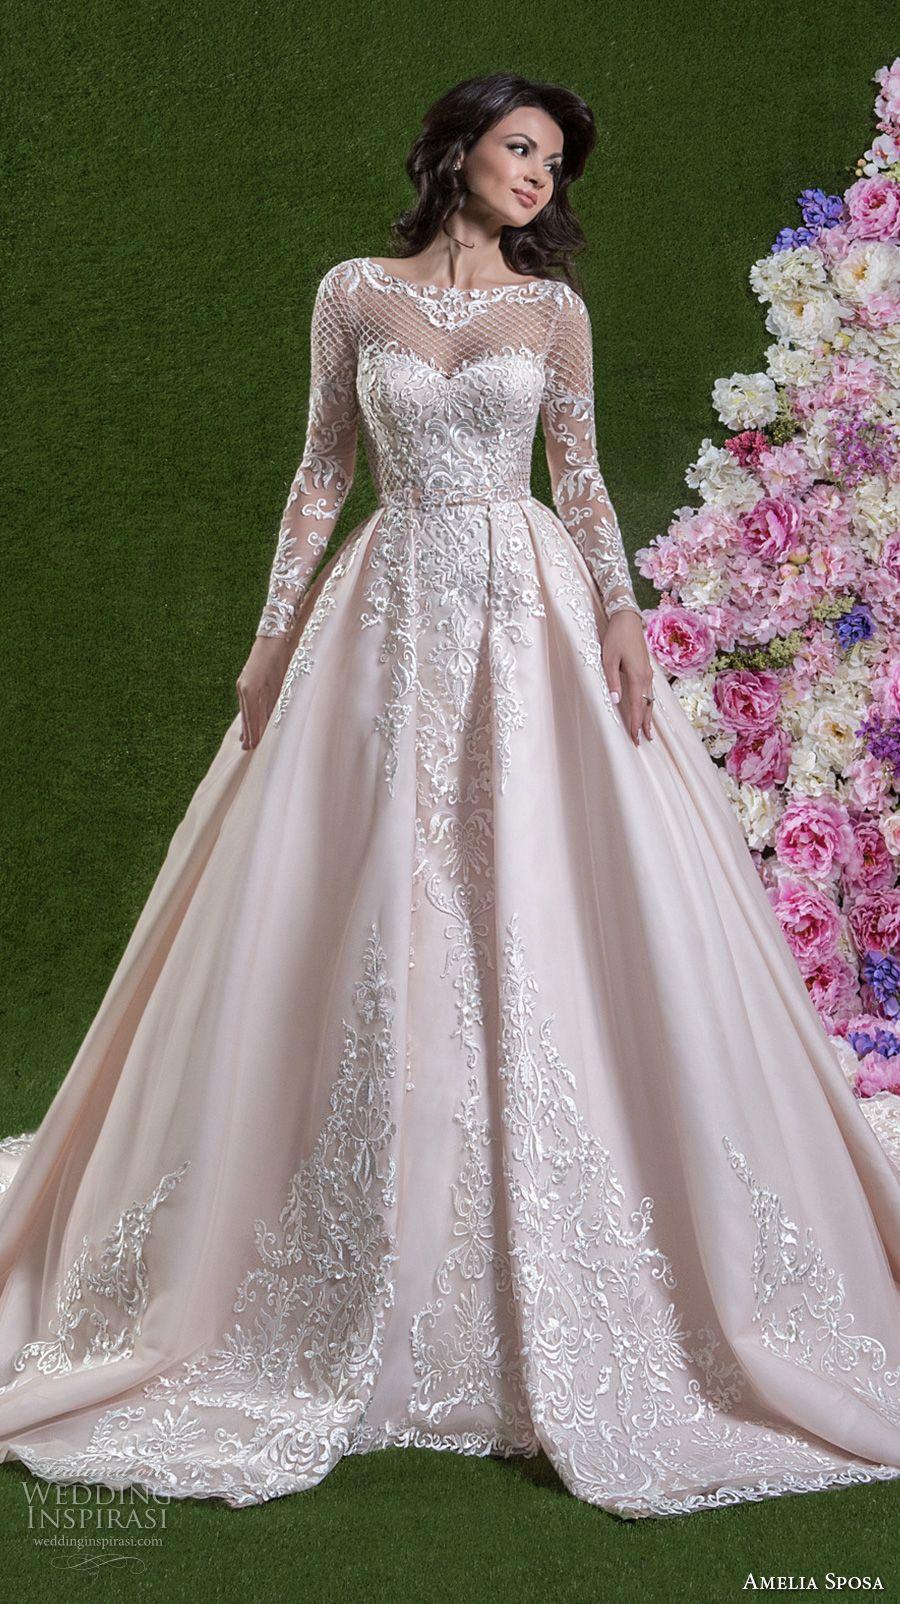 Amelia Sposa 2018 Wedding Dresses Wedding Inspirasi Wedding Dresses Pink Wedding Dresses Wedding Dresses Lace Ballgown